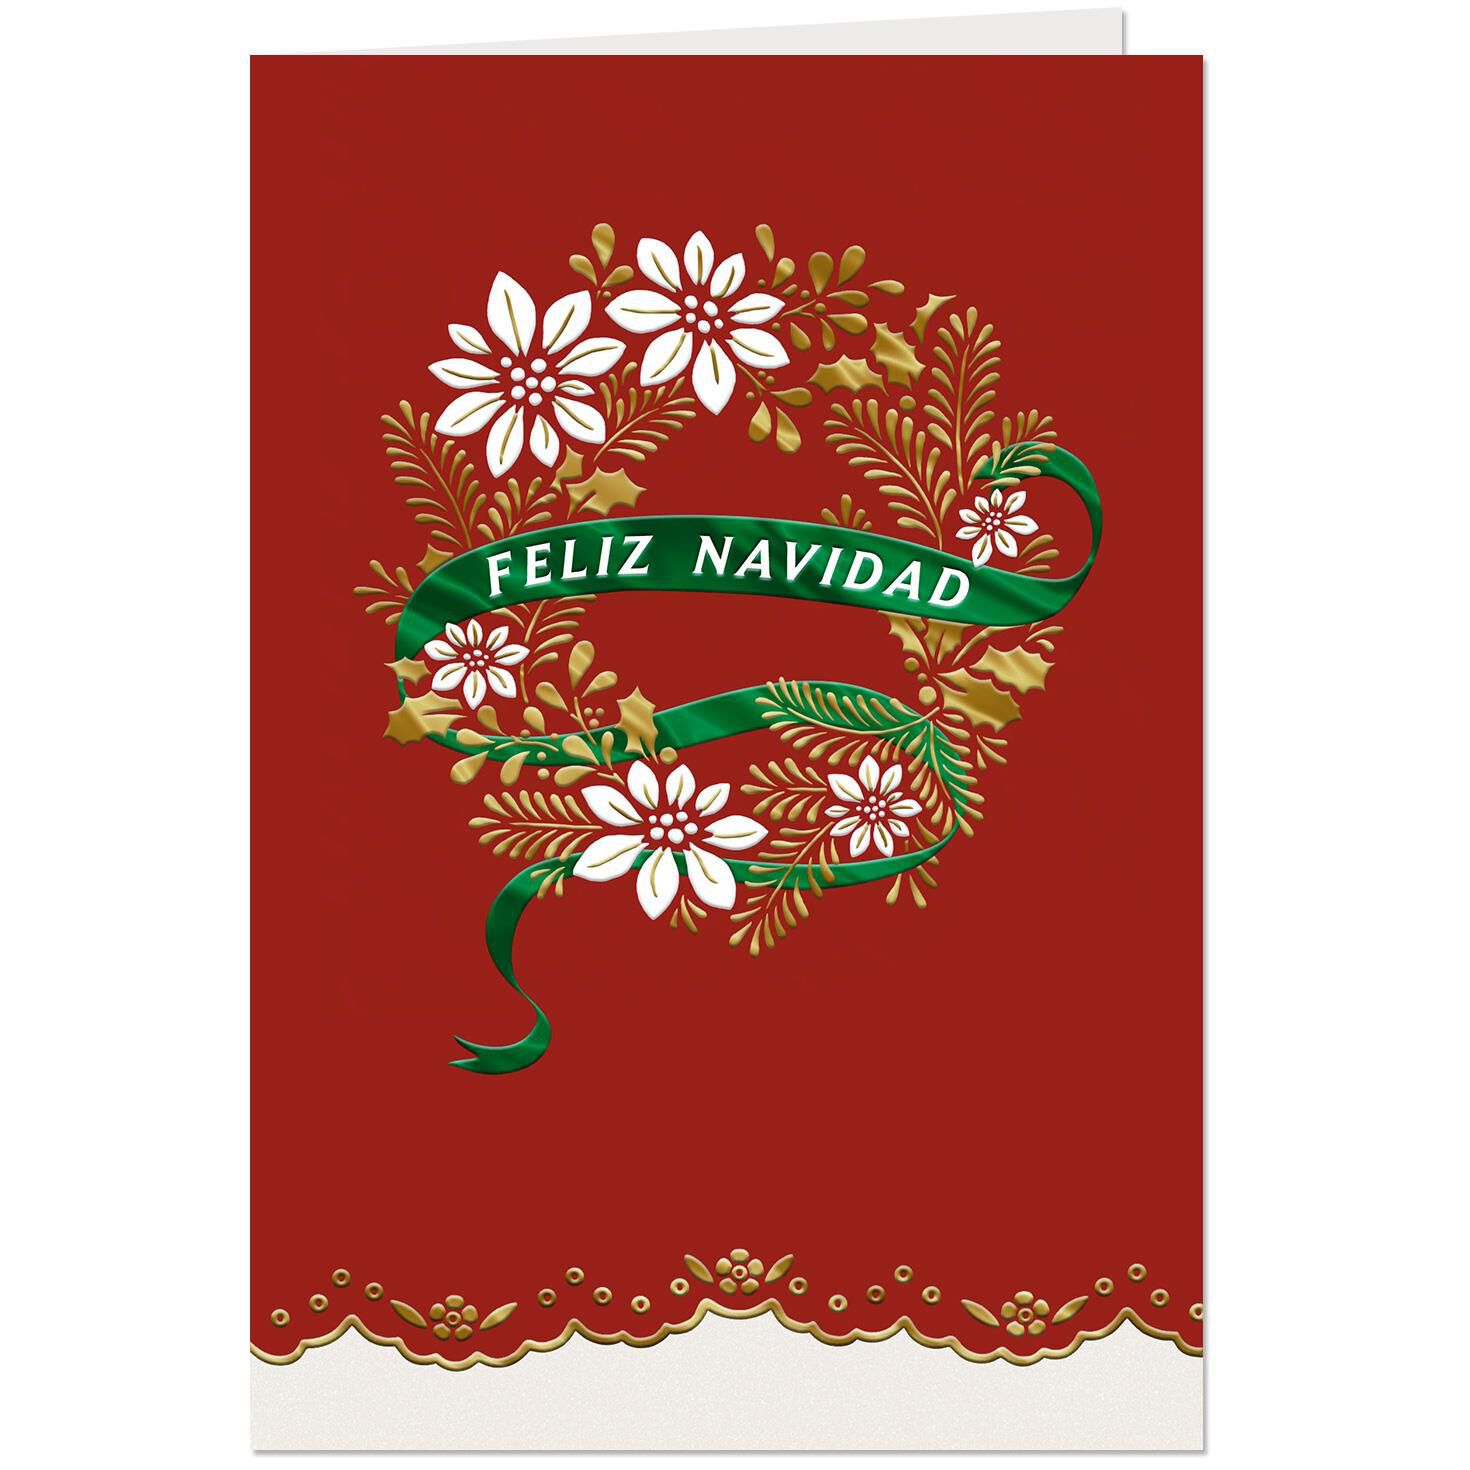 Feliz navidad wreath spanish language christmas card greeting feliz navidad wreath spanish language christmas card greeting cards hallmark m4hsunfo